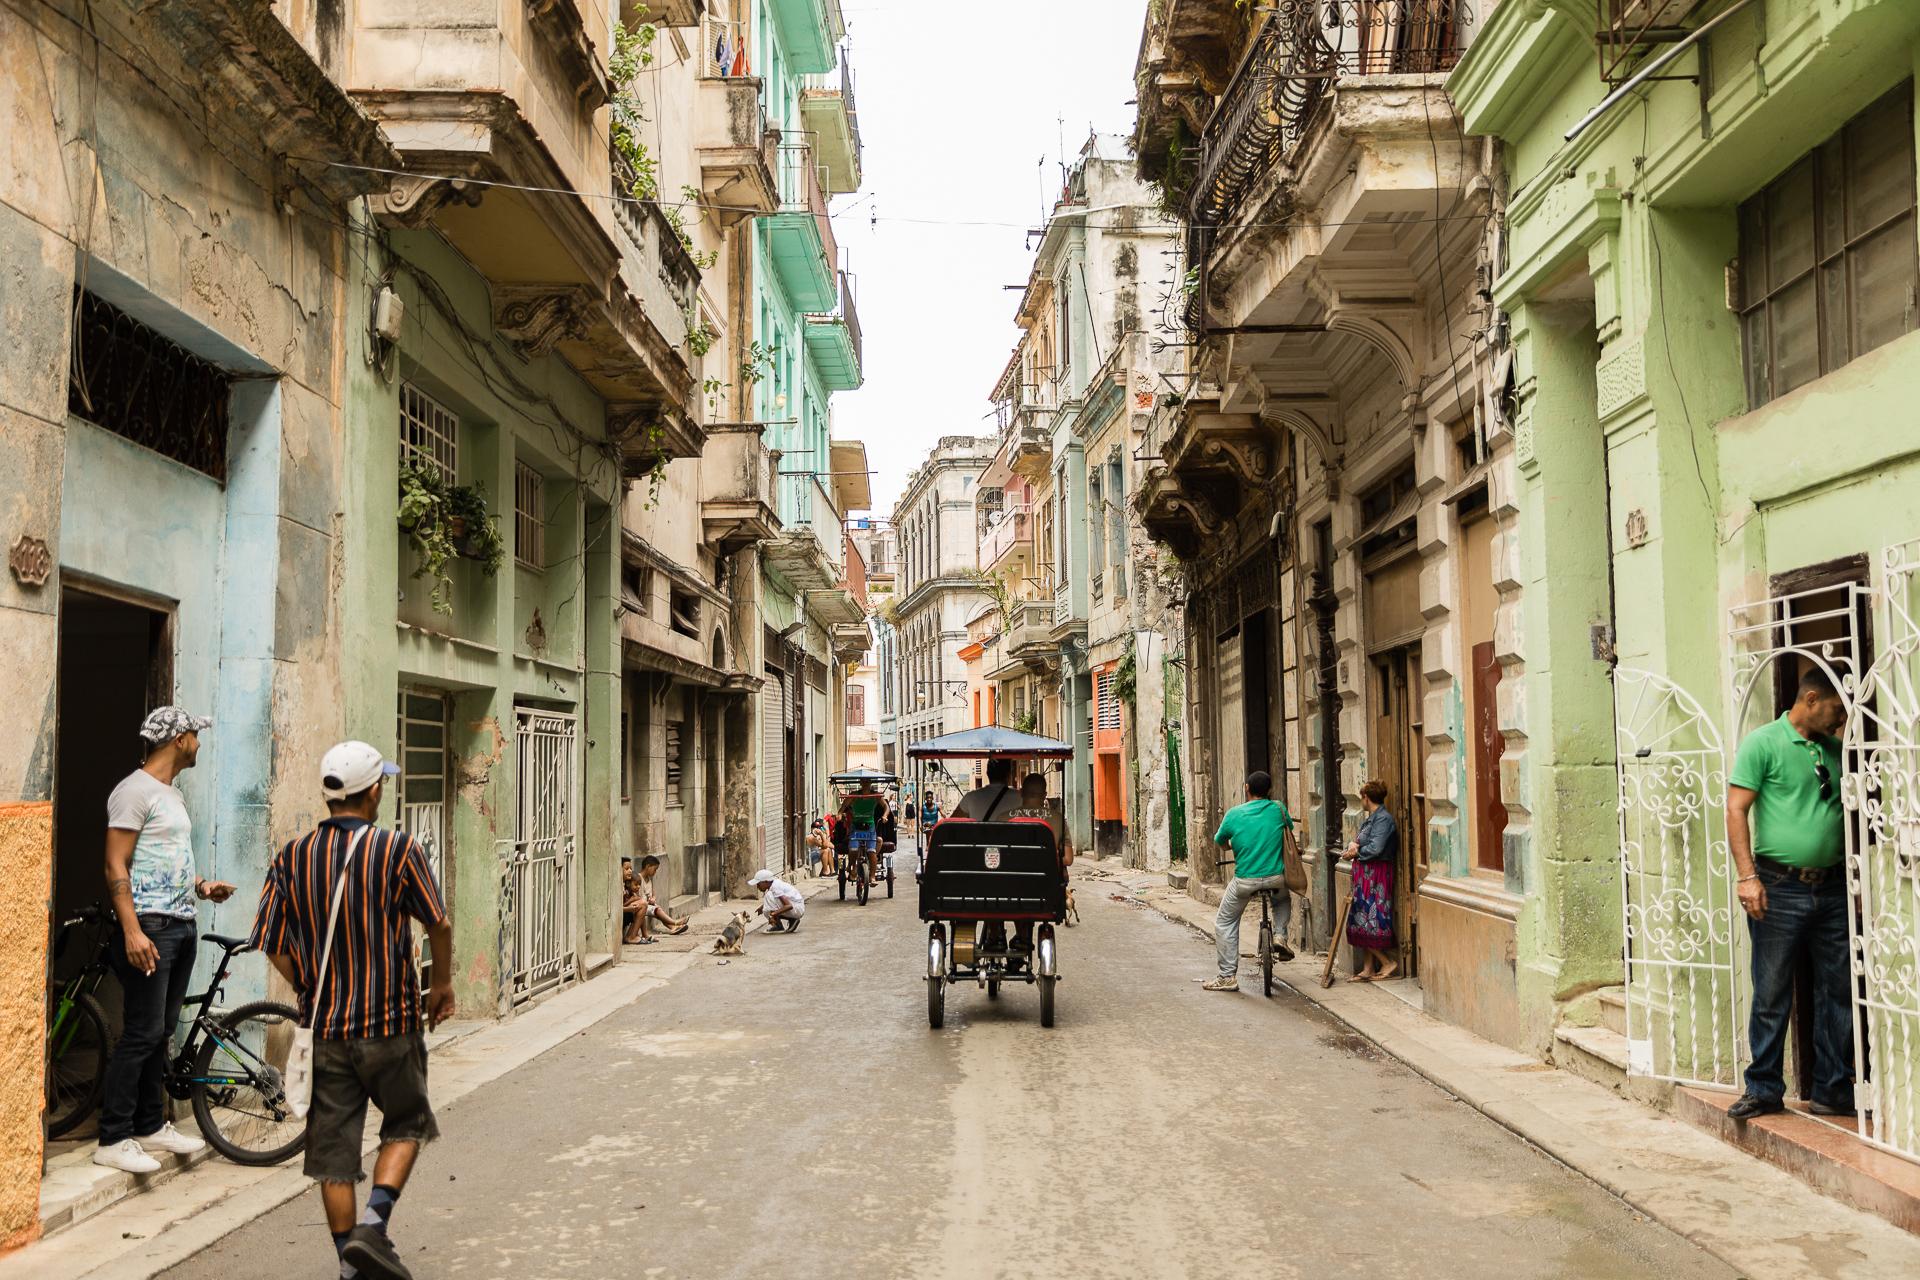 In den Straßen Havannas - Sehenswürdigkeiten in Kubas Hauptstadt